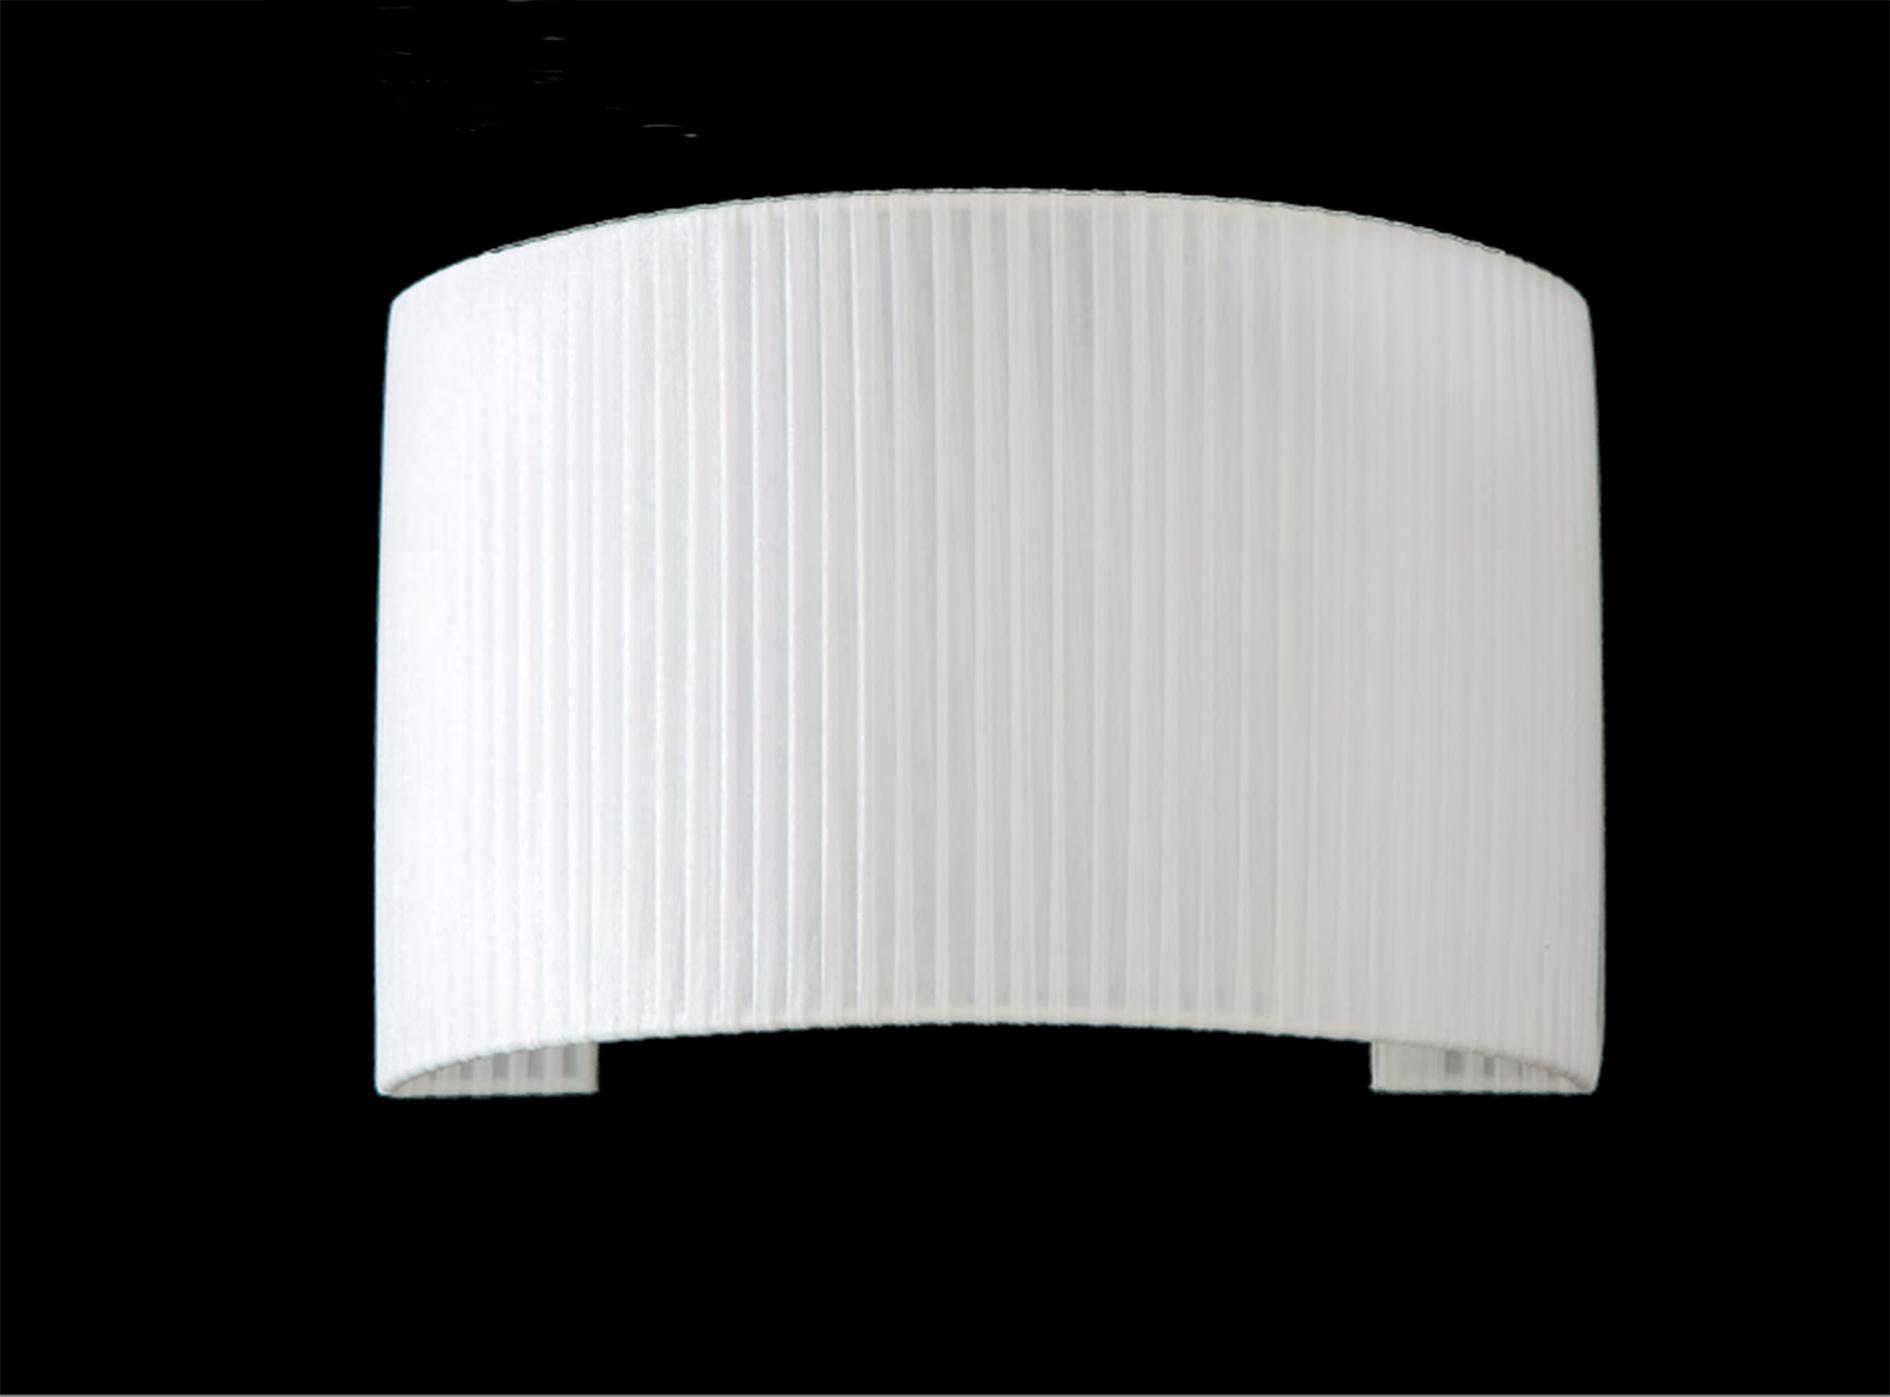 Lampade Moderne Da Parete : Lampade da parete moderne applique novit ...